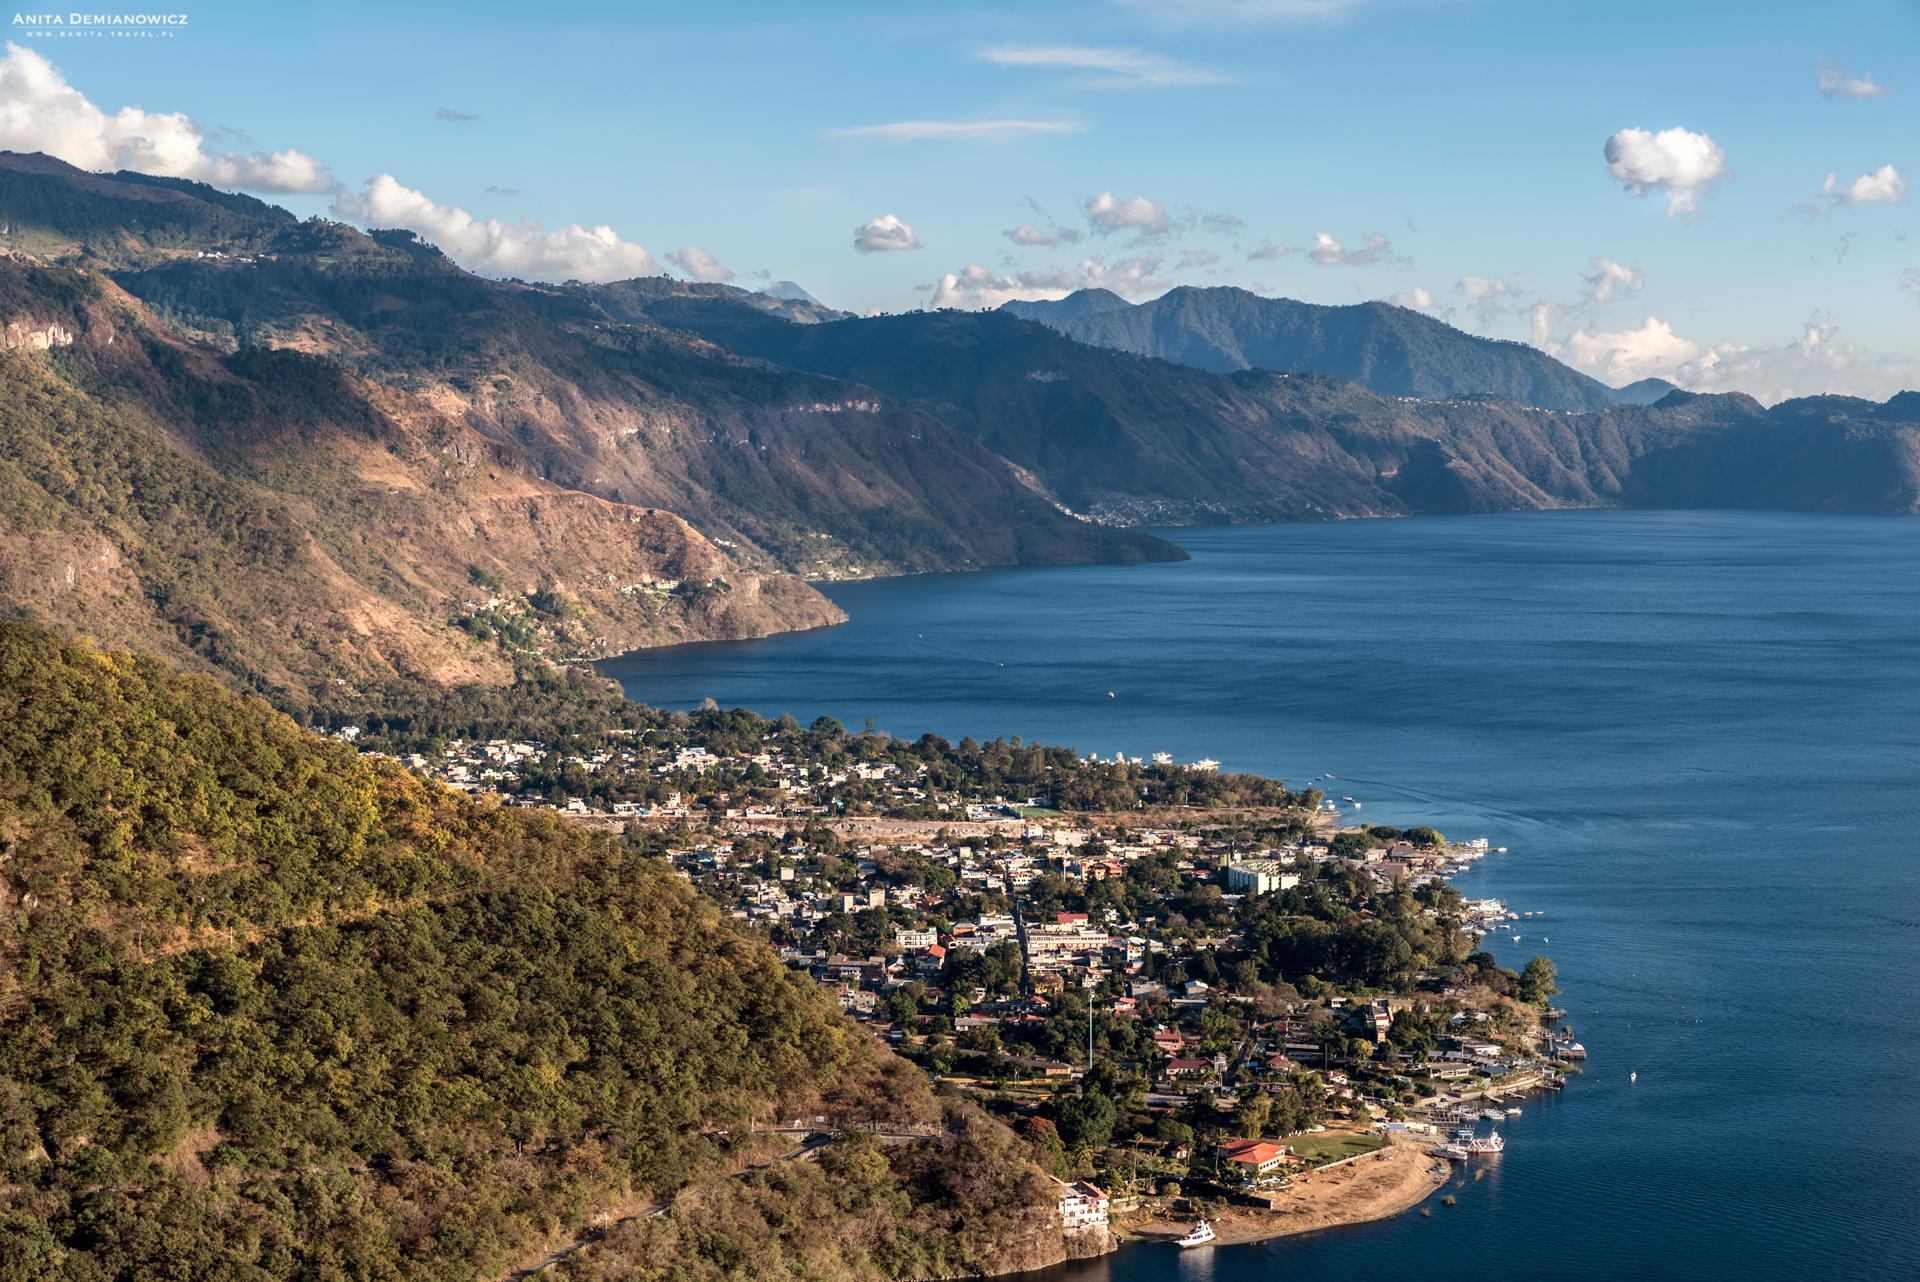 Mirador San Jorge, Jezioro Atitlan, Gwatemala